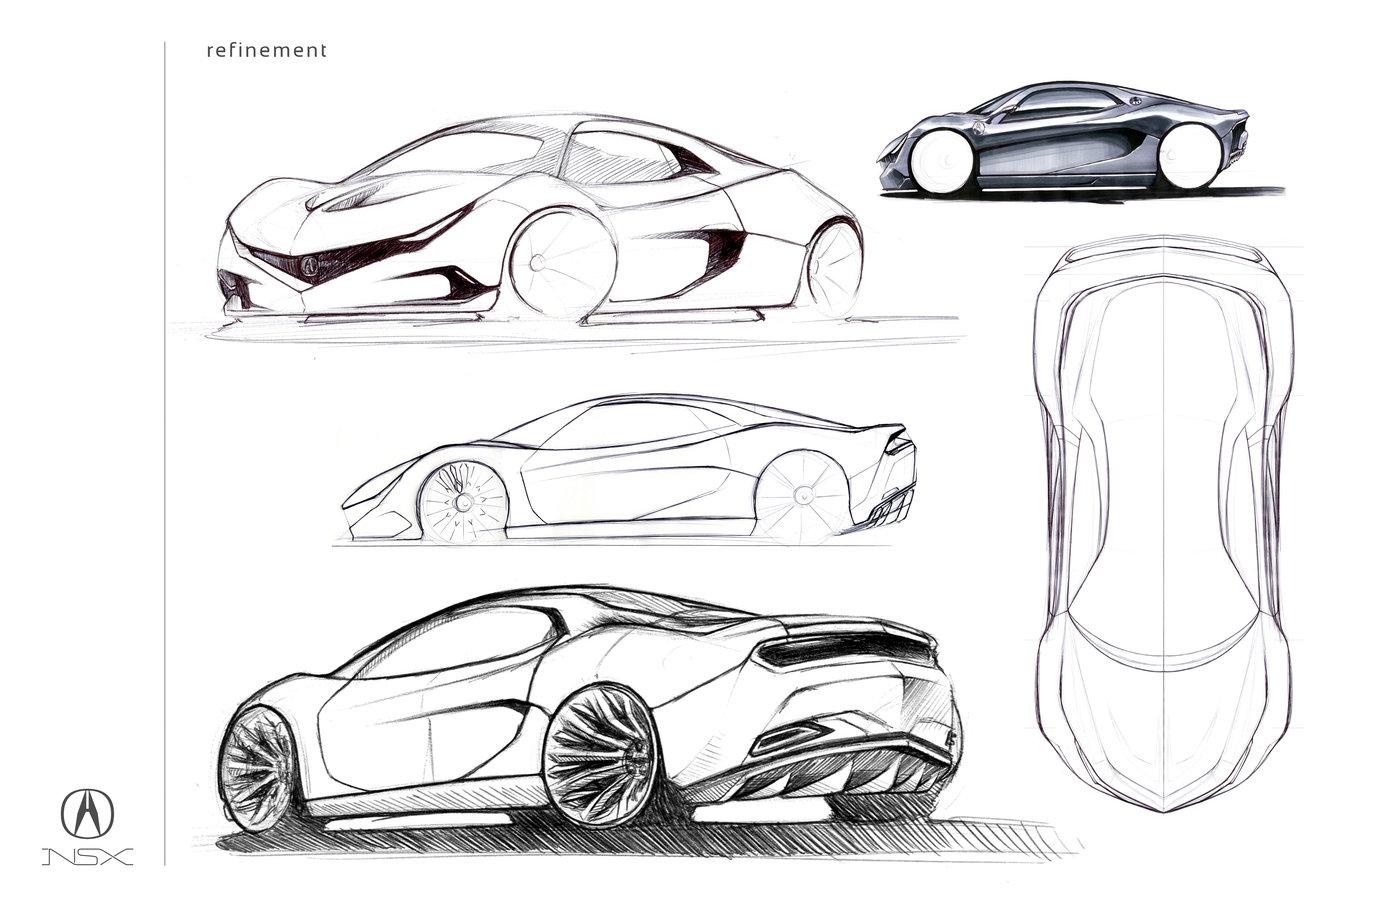 Nsx Concept By Jake Bosnak At Coroflot